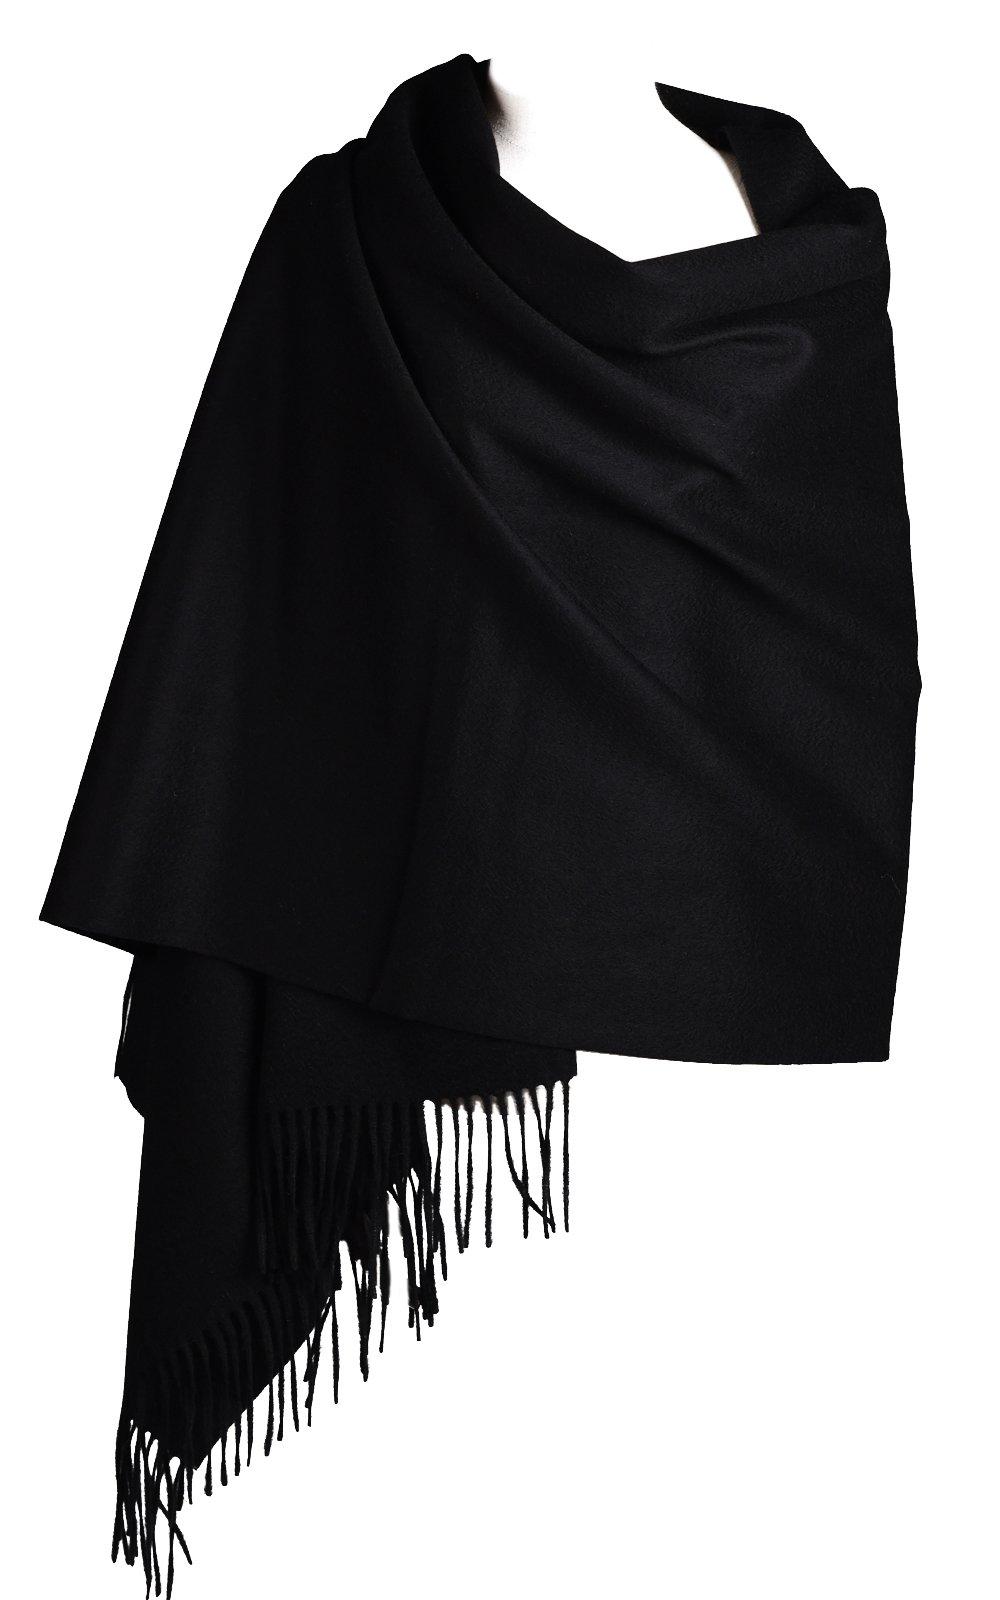 Women Soft Cashmere Wool Wraps Shawls Stole Scarf - Large Size 78''x 28''(Black)